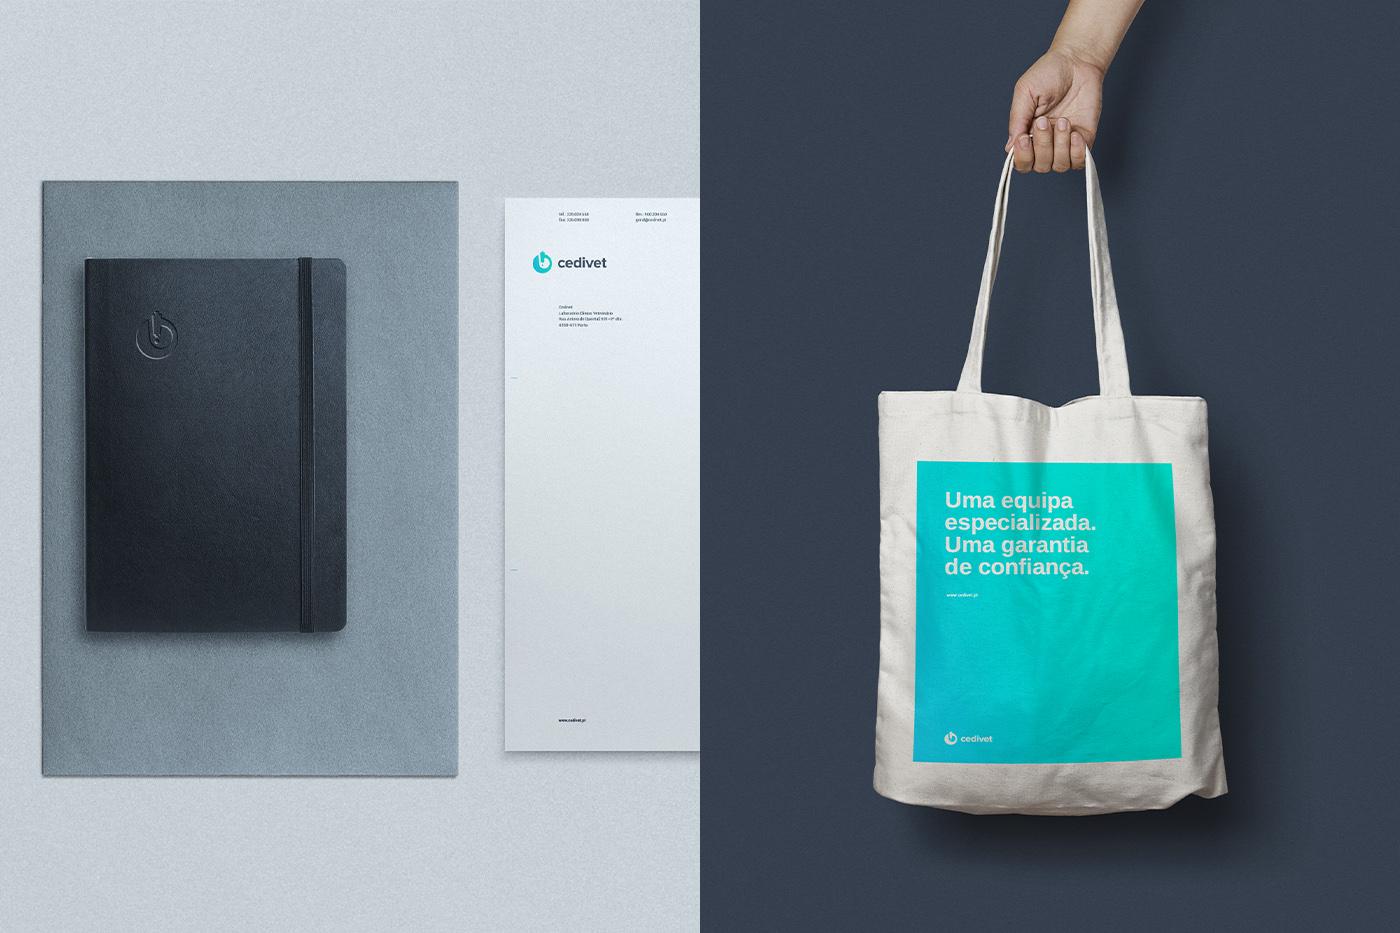 Cedivet+Veterinary+Lab+identity+by+Gen+design+studio-1.jpg